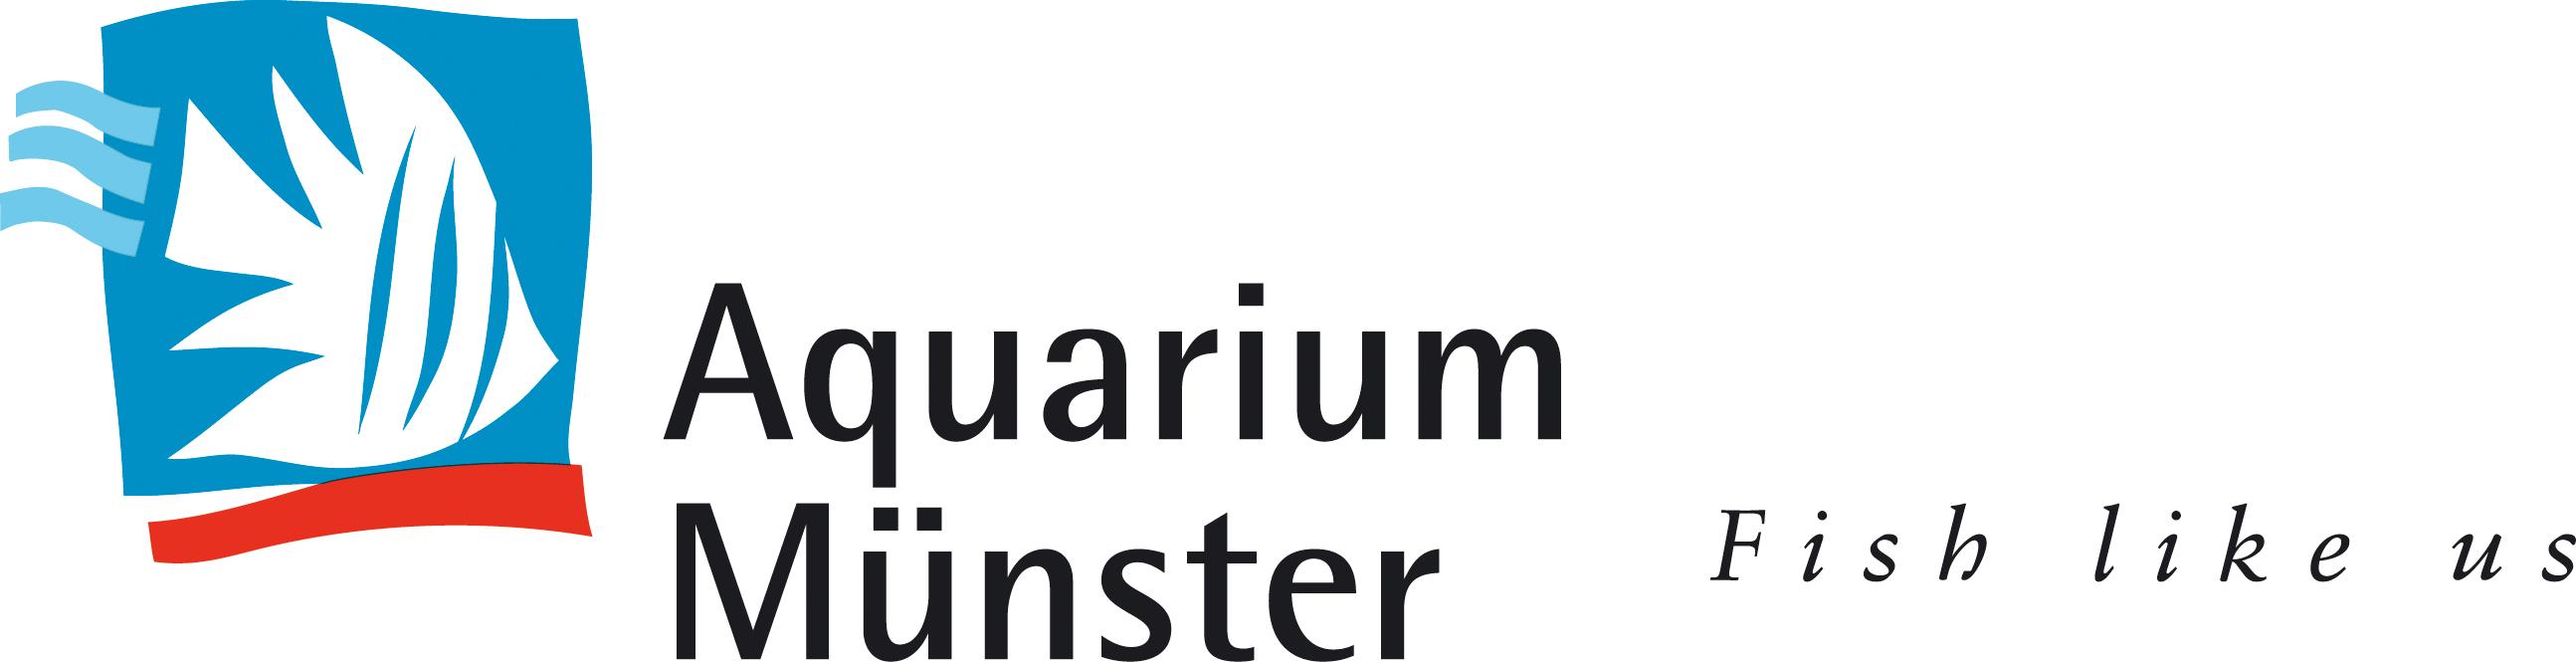 Logo-Aquarium-Munster-long-color